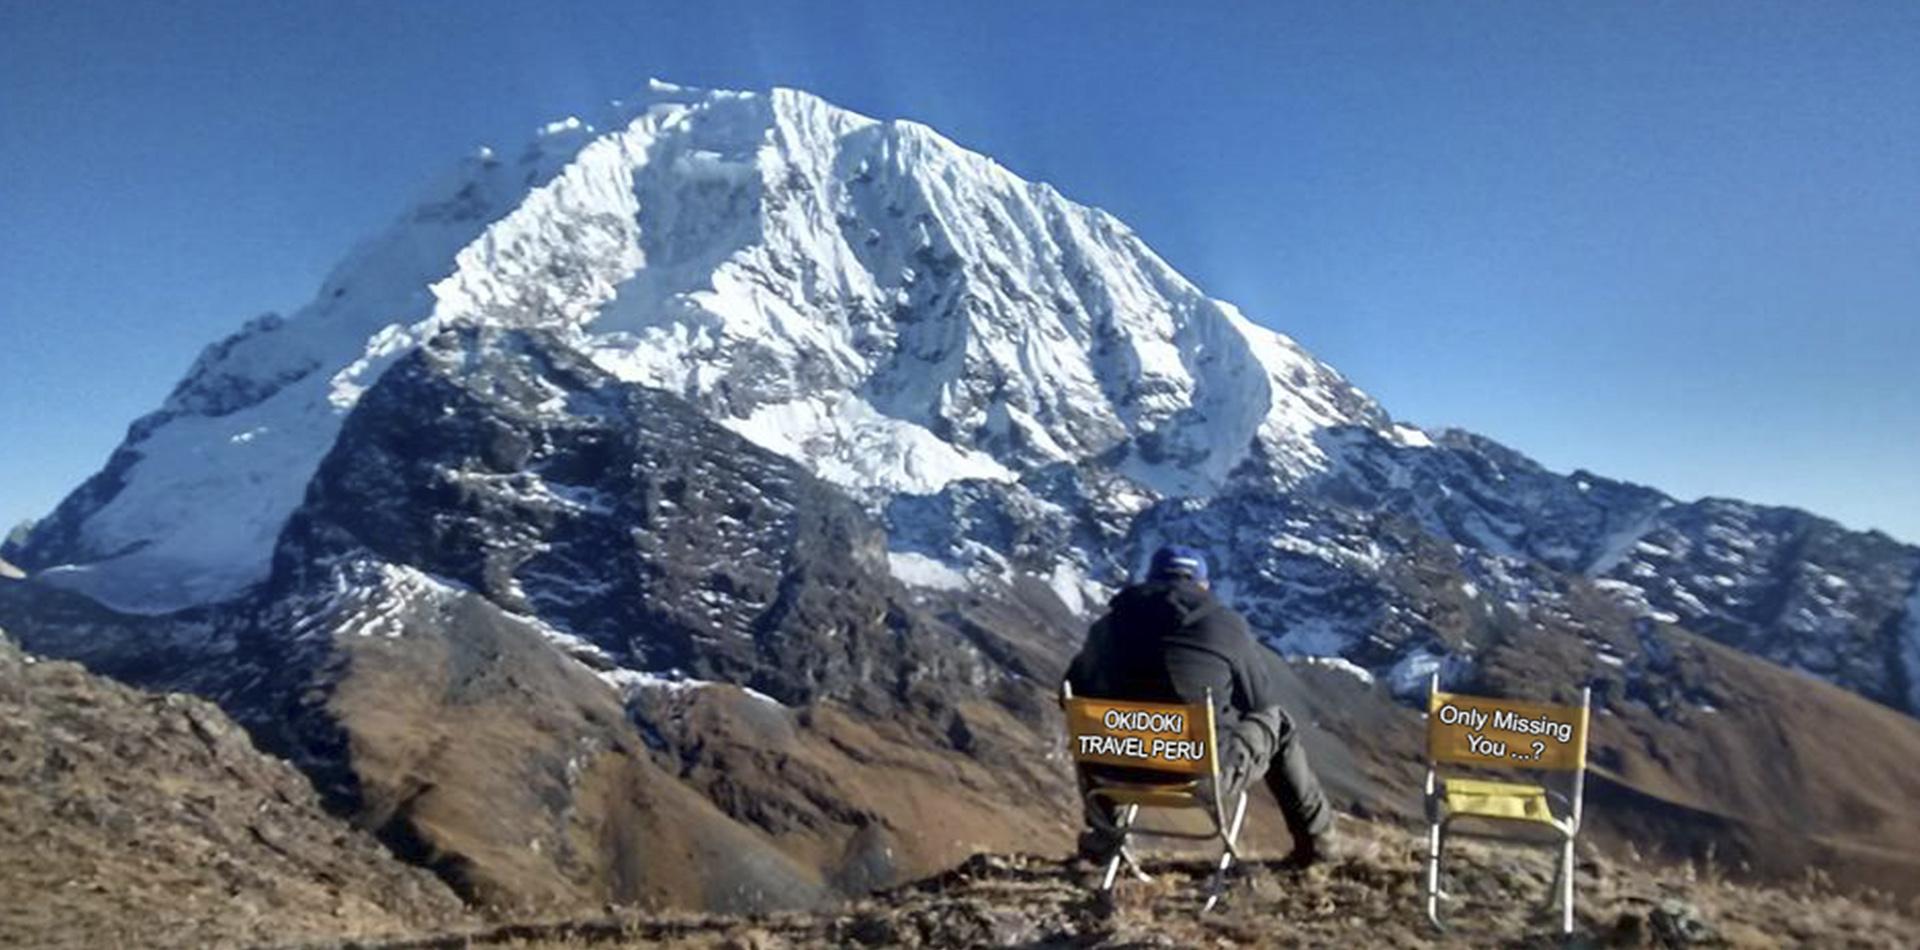 Salkantay Trek to Machu Picchu 6days return by bus last day